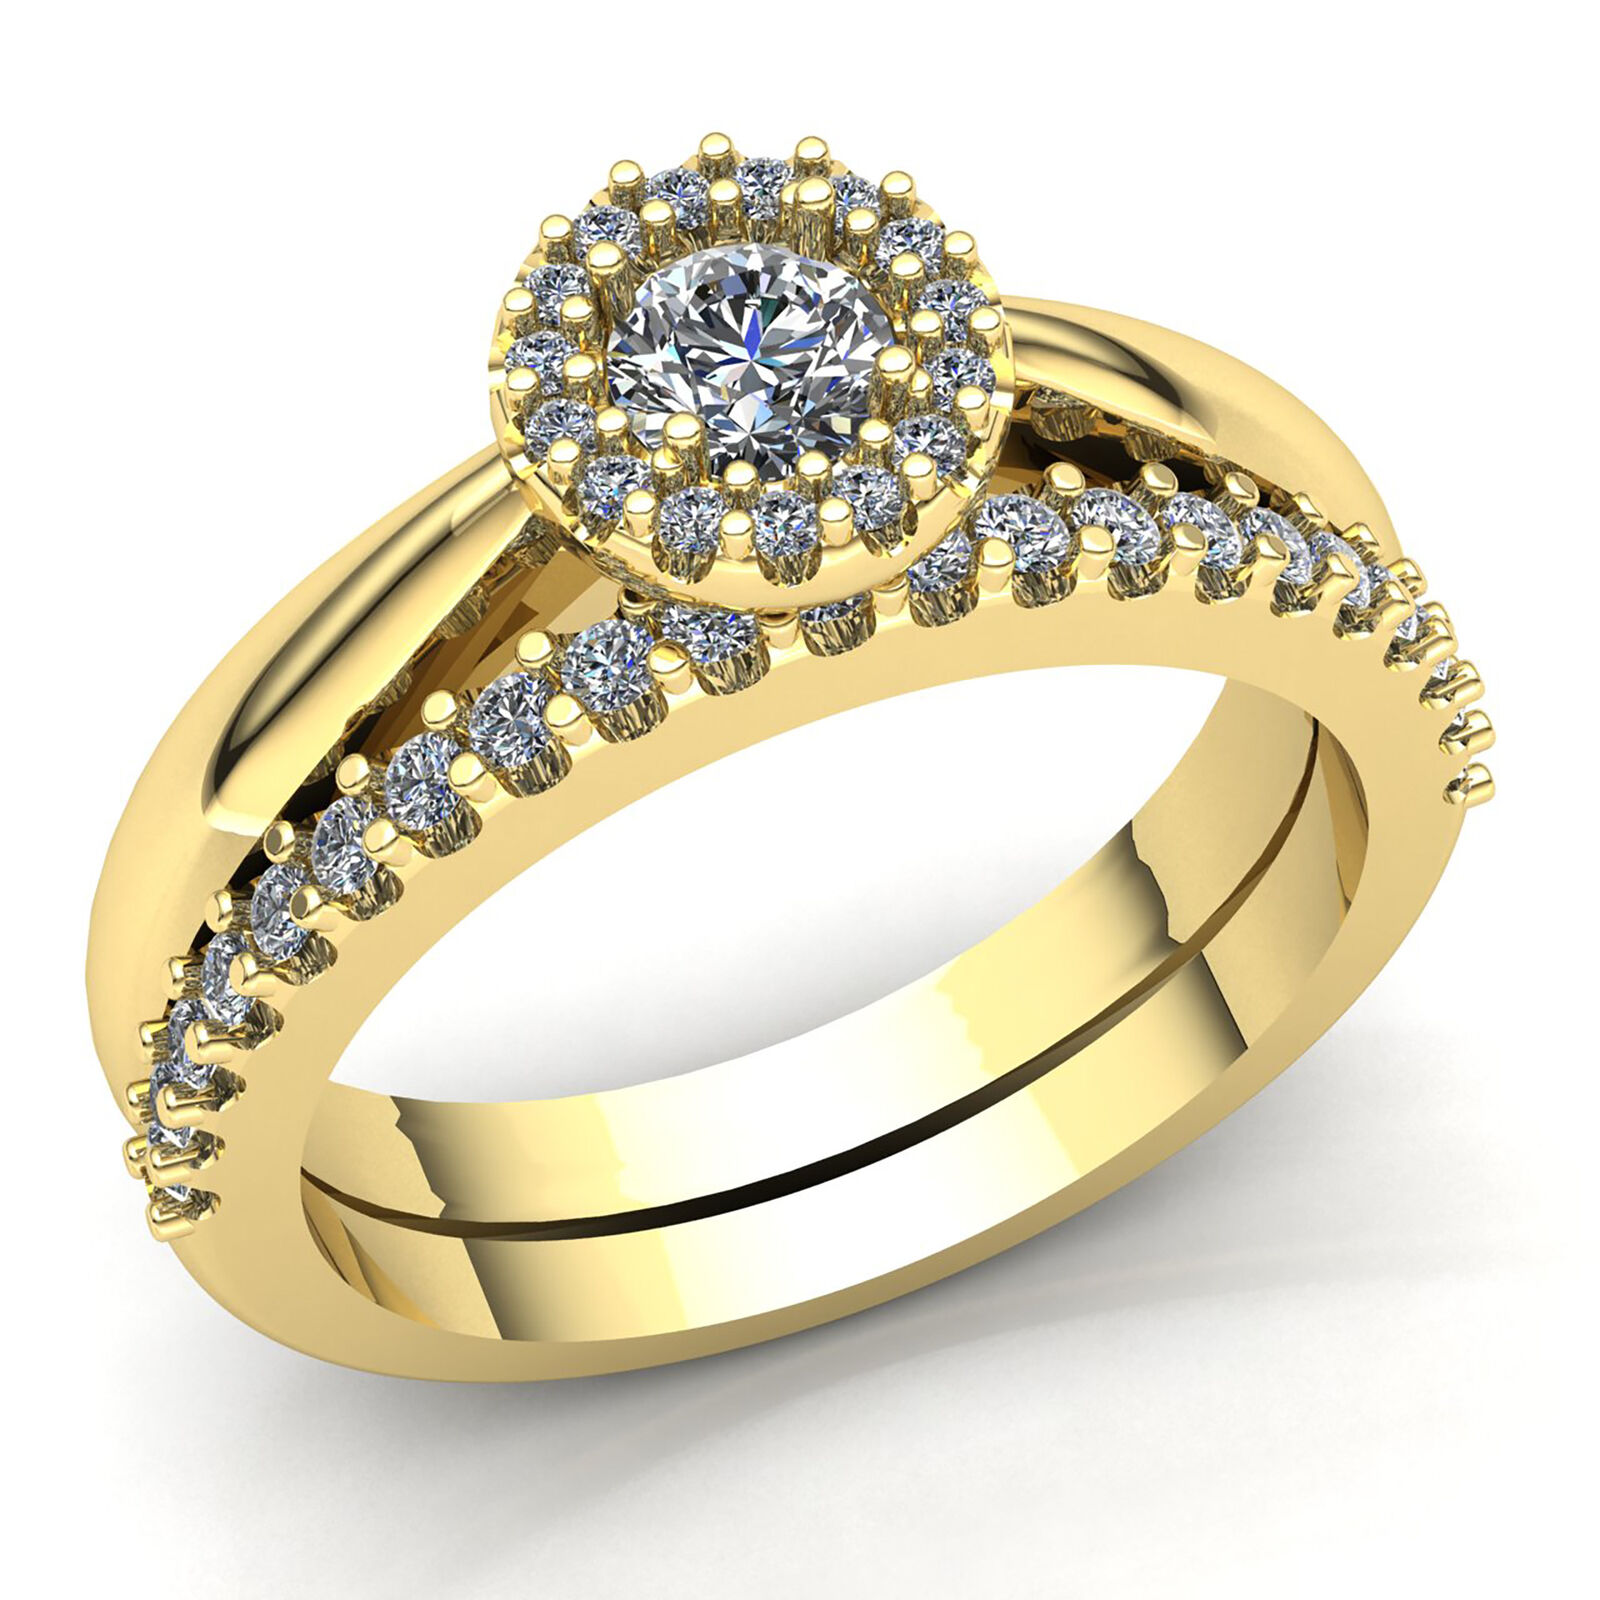 Genuine 2ct Round Cut Diamond Ladies Solitaire Accent Engagement Ring 10K gold